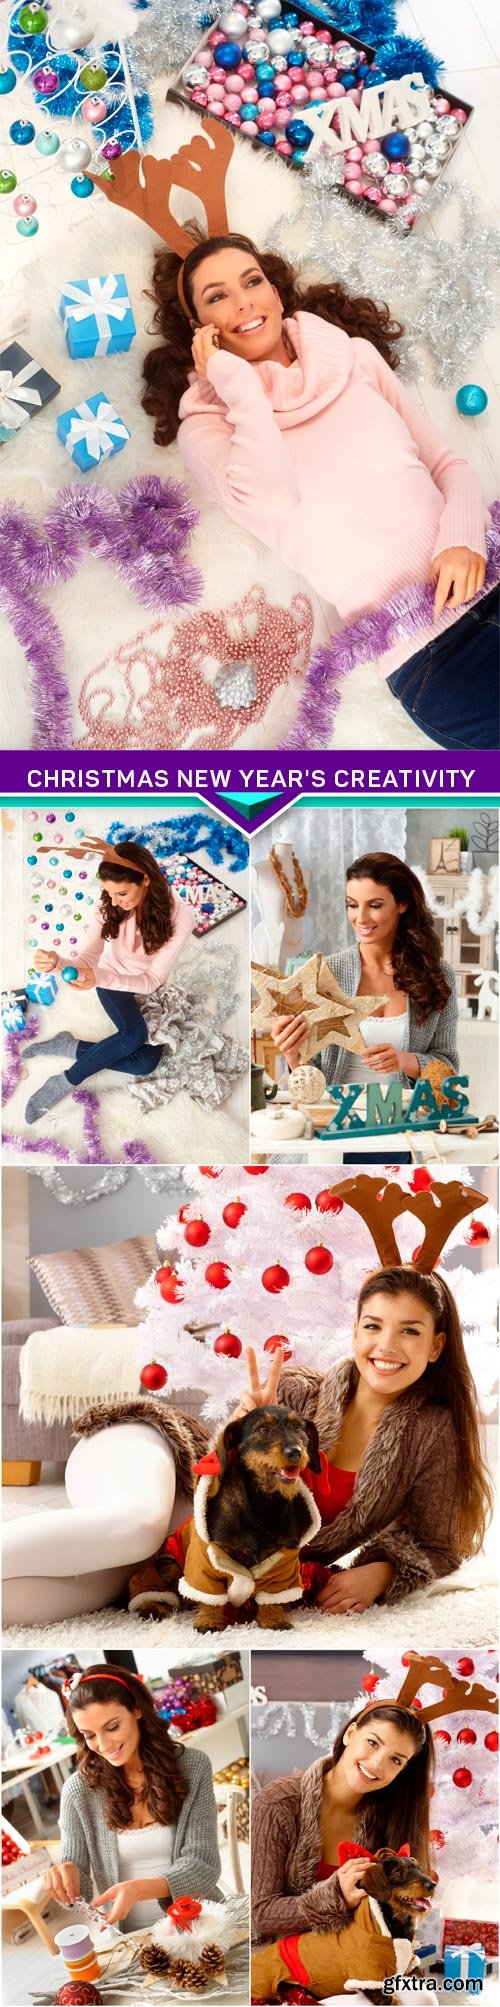 Christmas New Year's creativity 6x JPEG